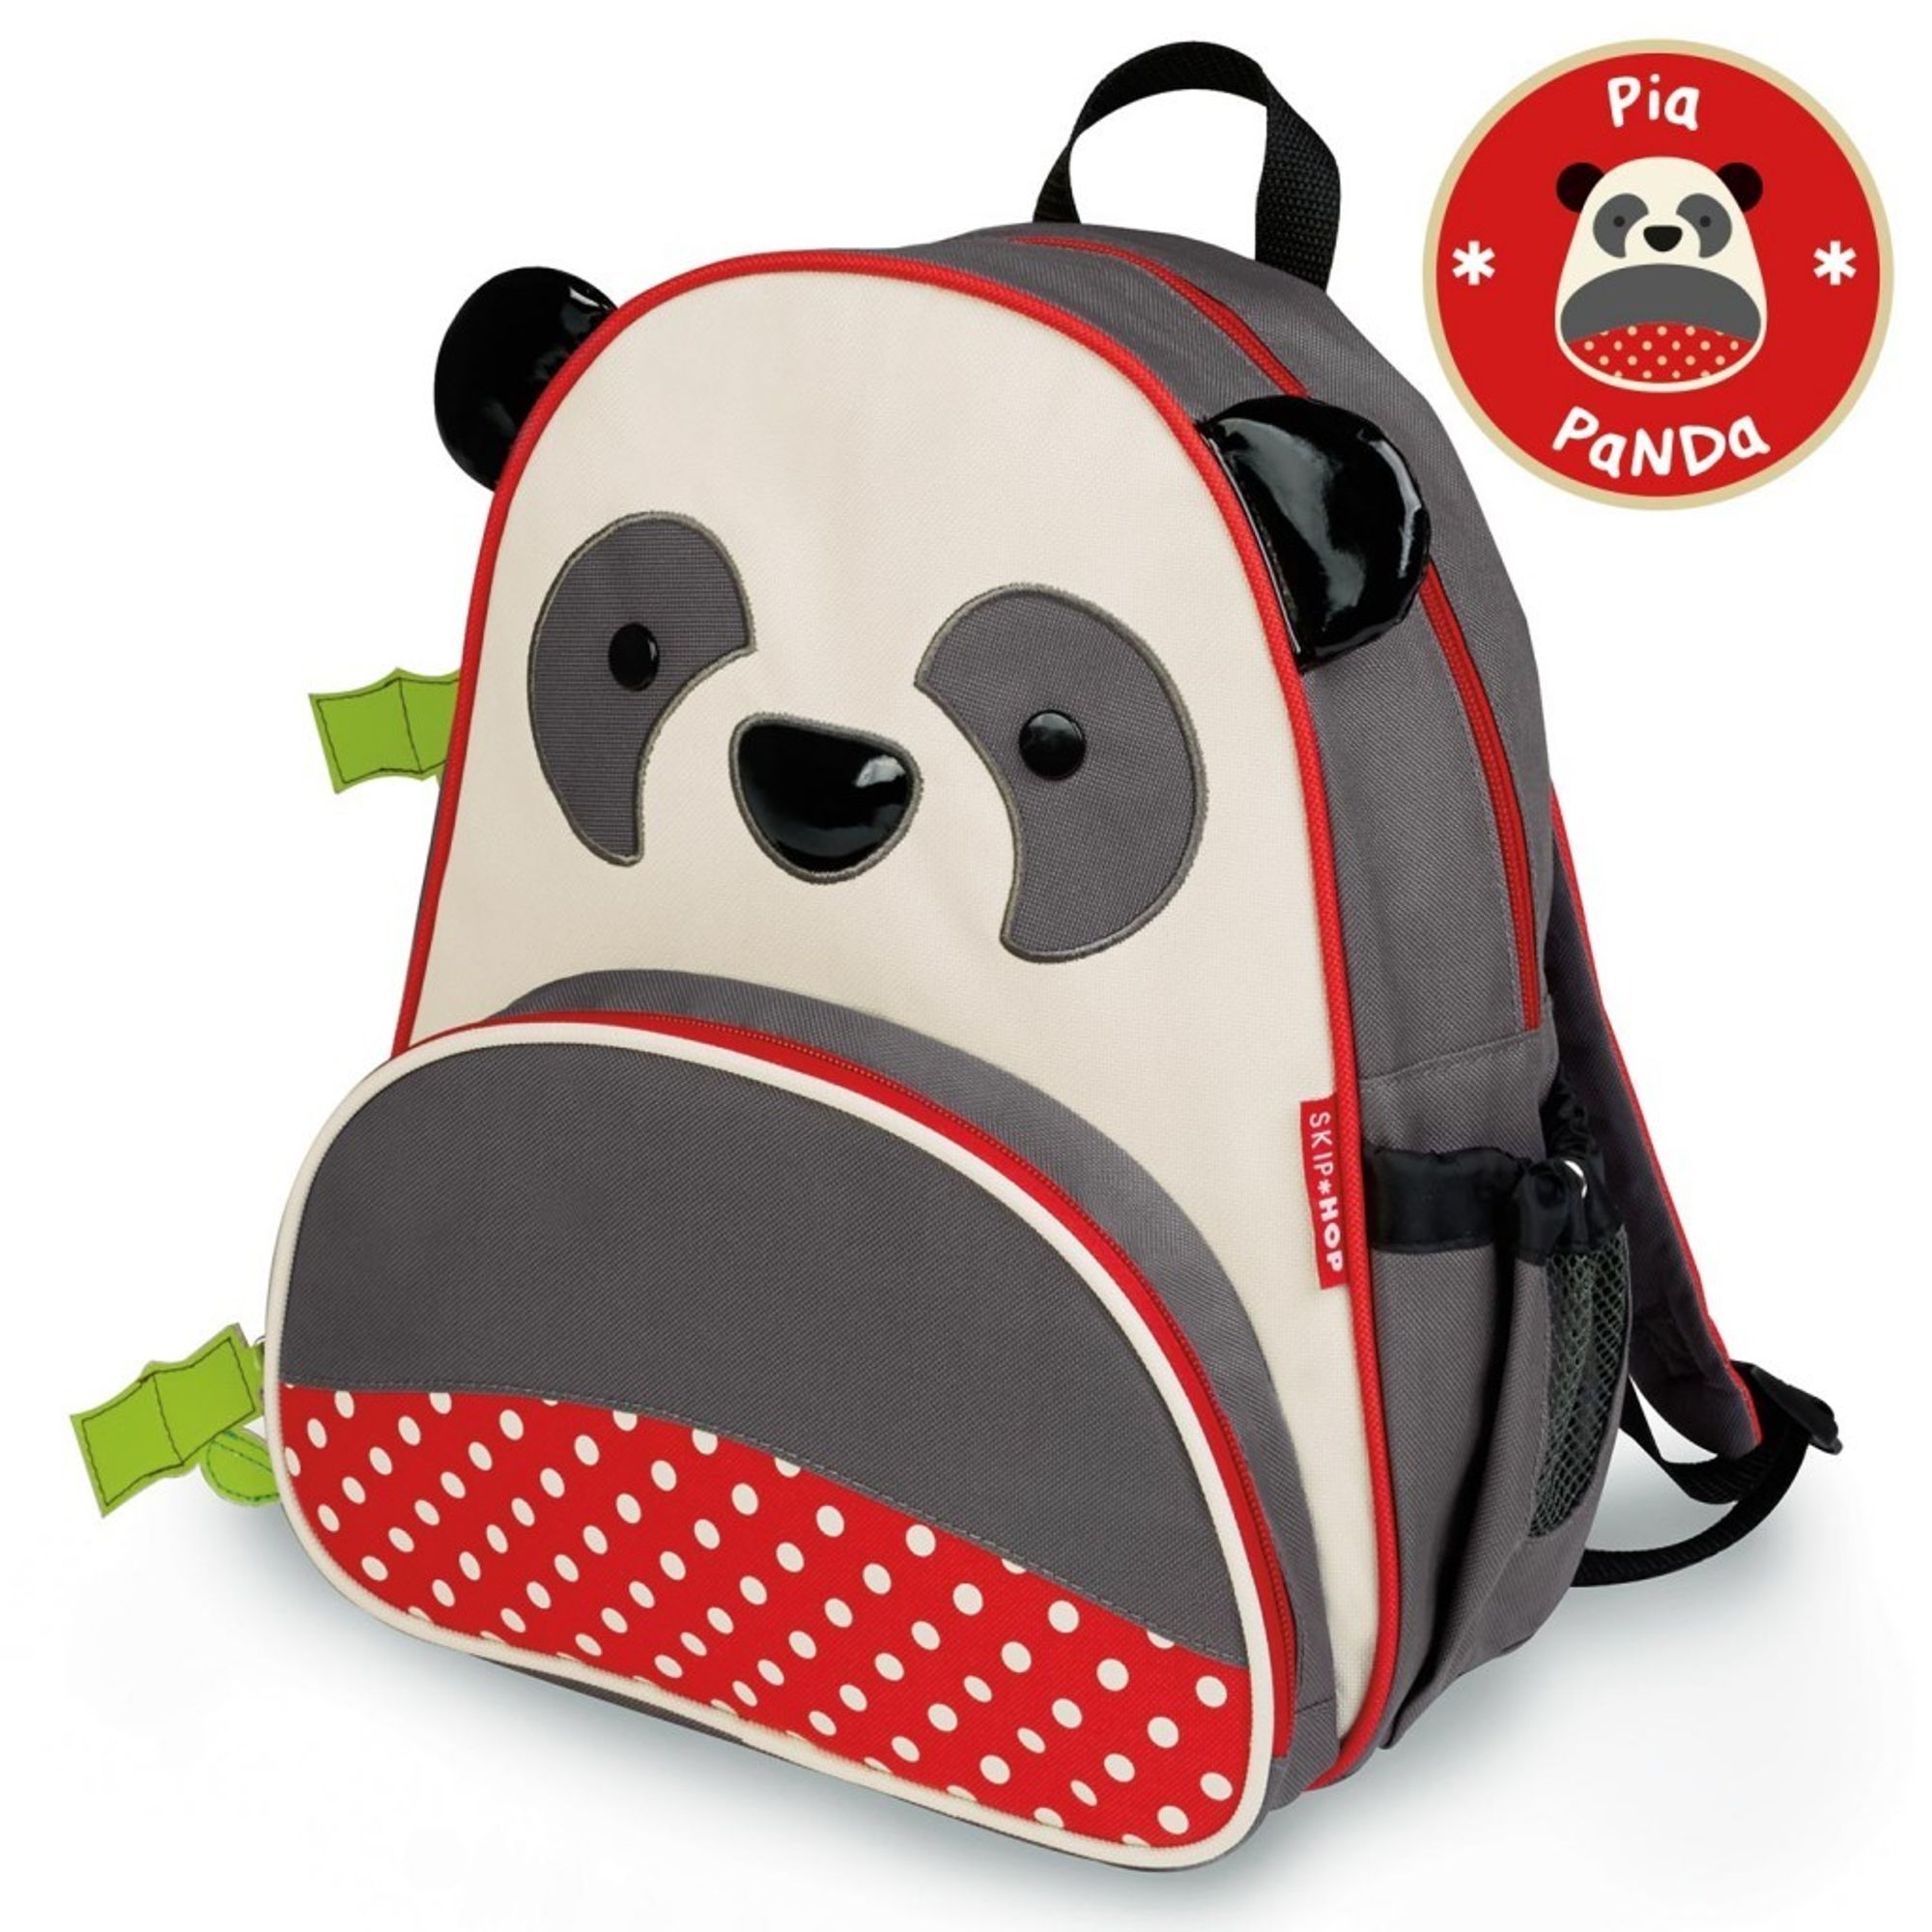 mochila-infantil-zoo-panda-skip-hop